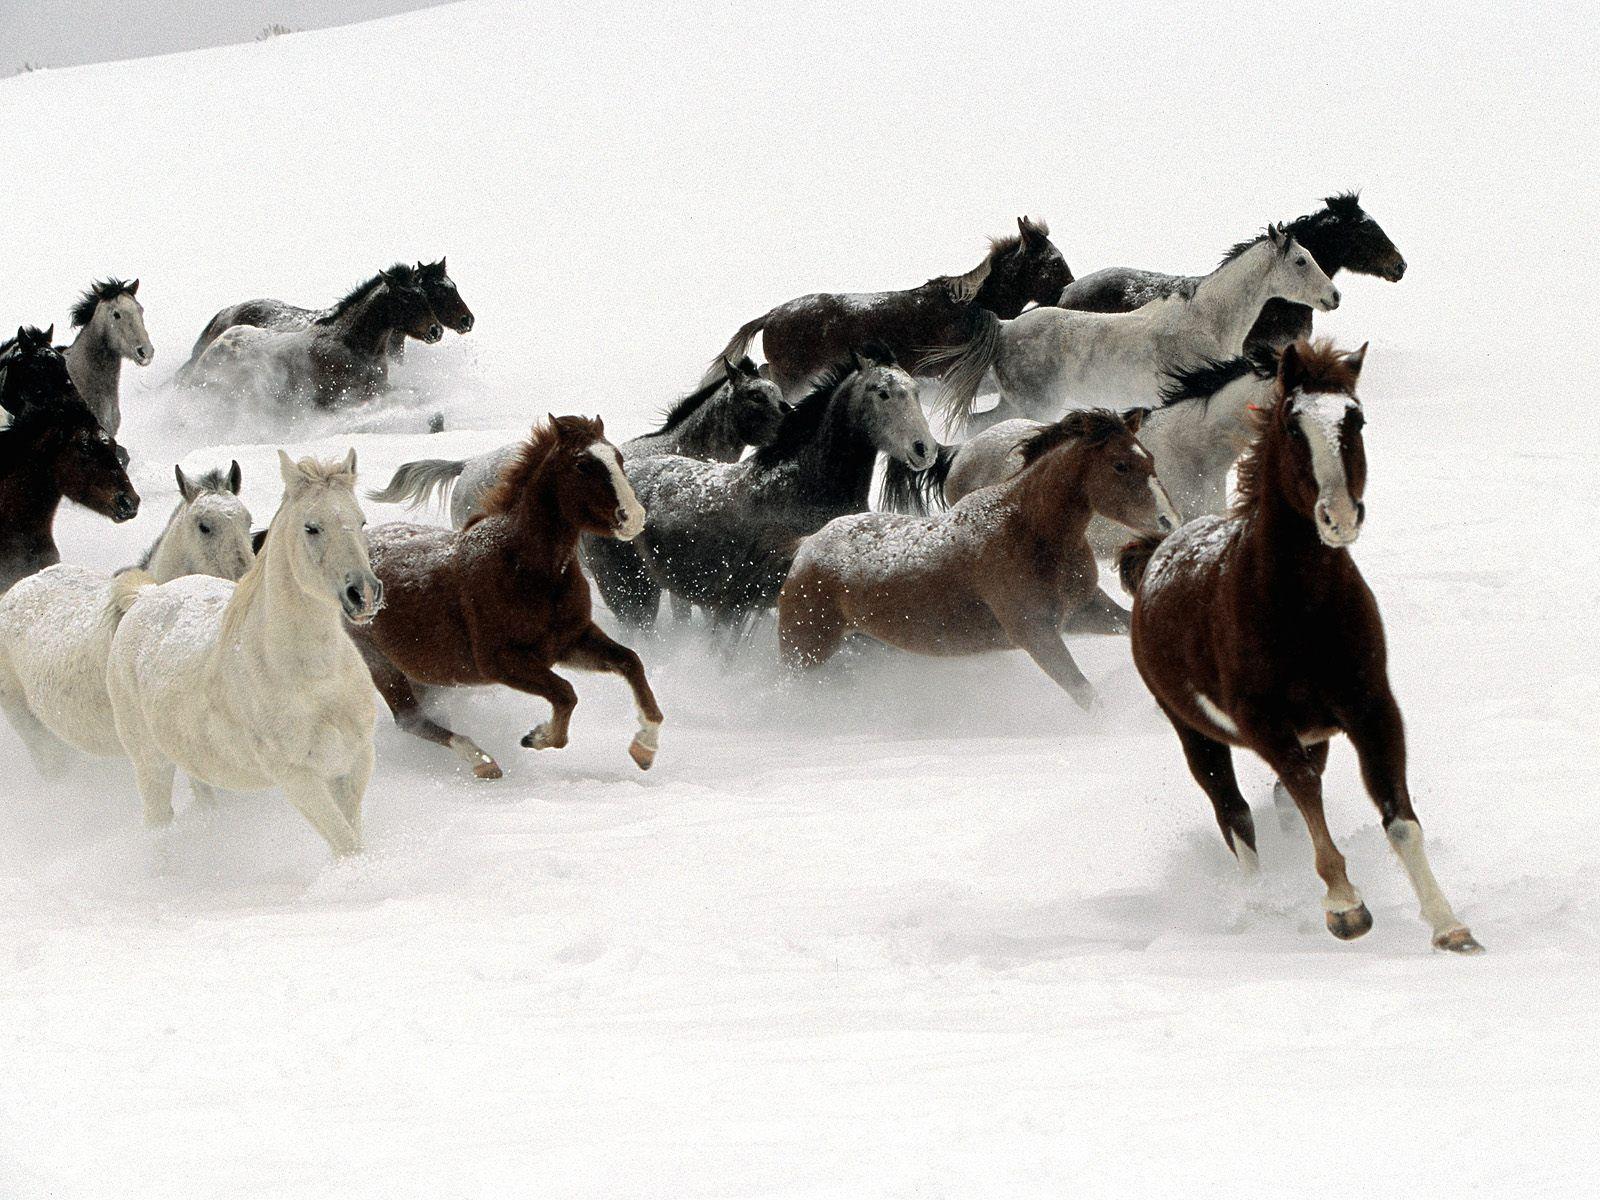 Download Wallpaper Horse Chromebook - 17d2612c1610cbc1b178e400e4ea24bc  Image_607051.jpg